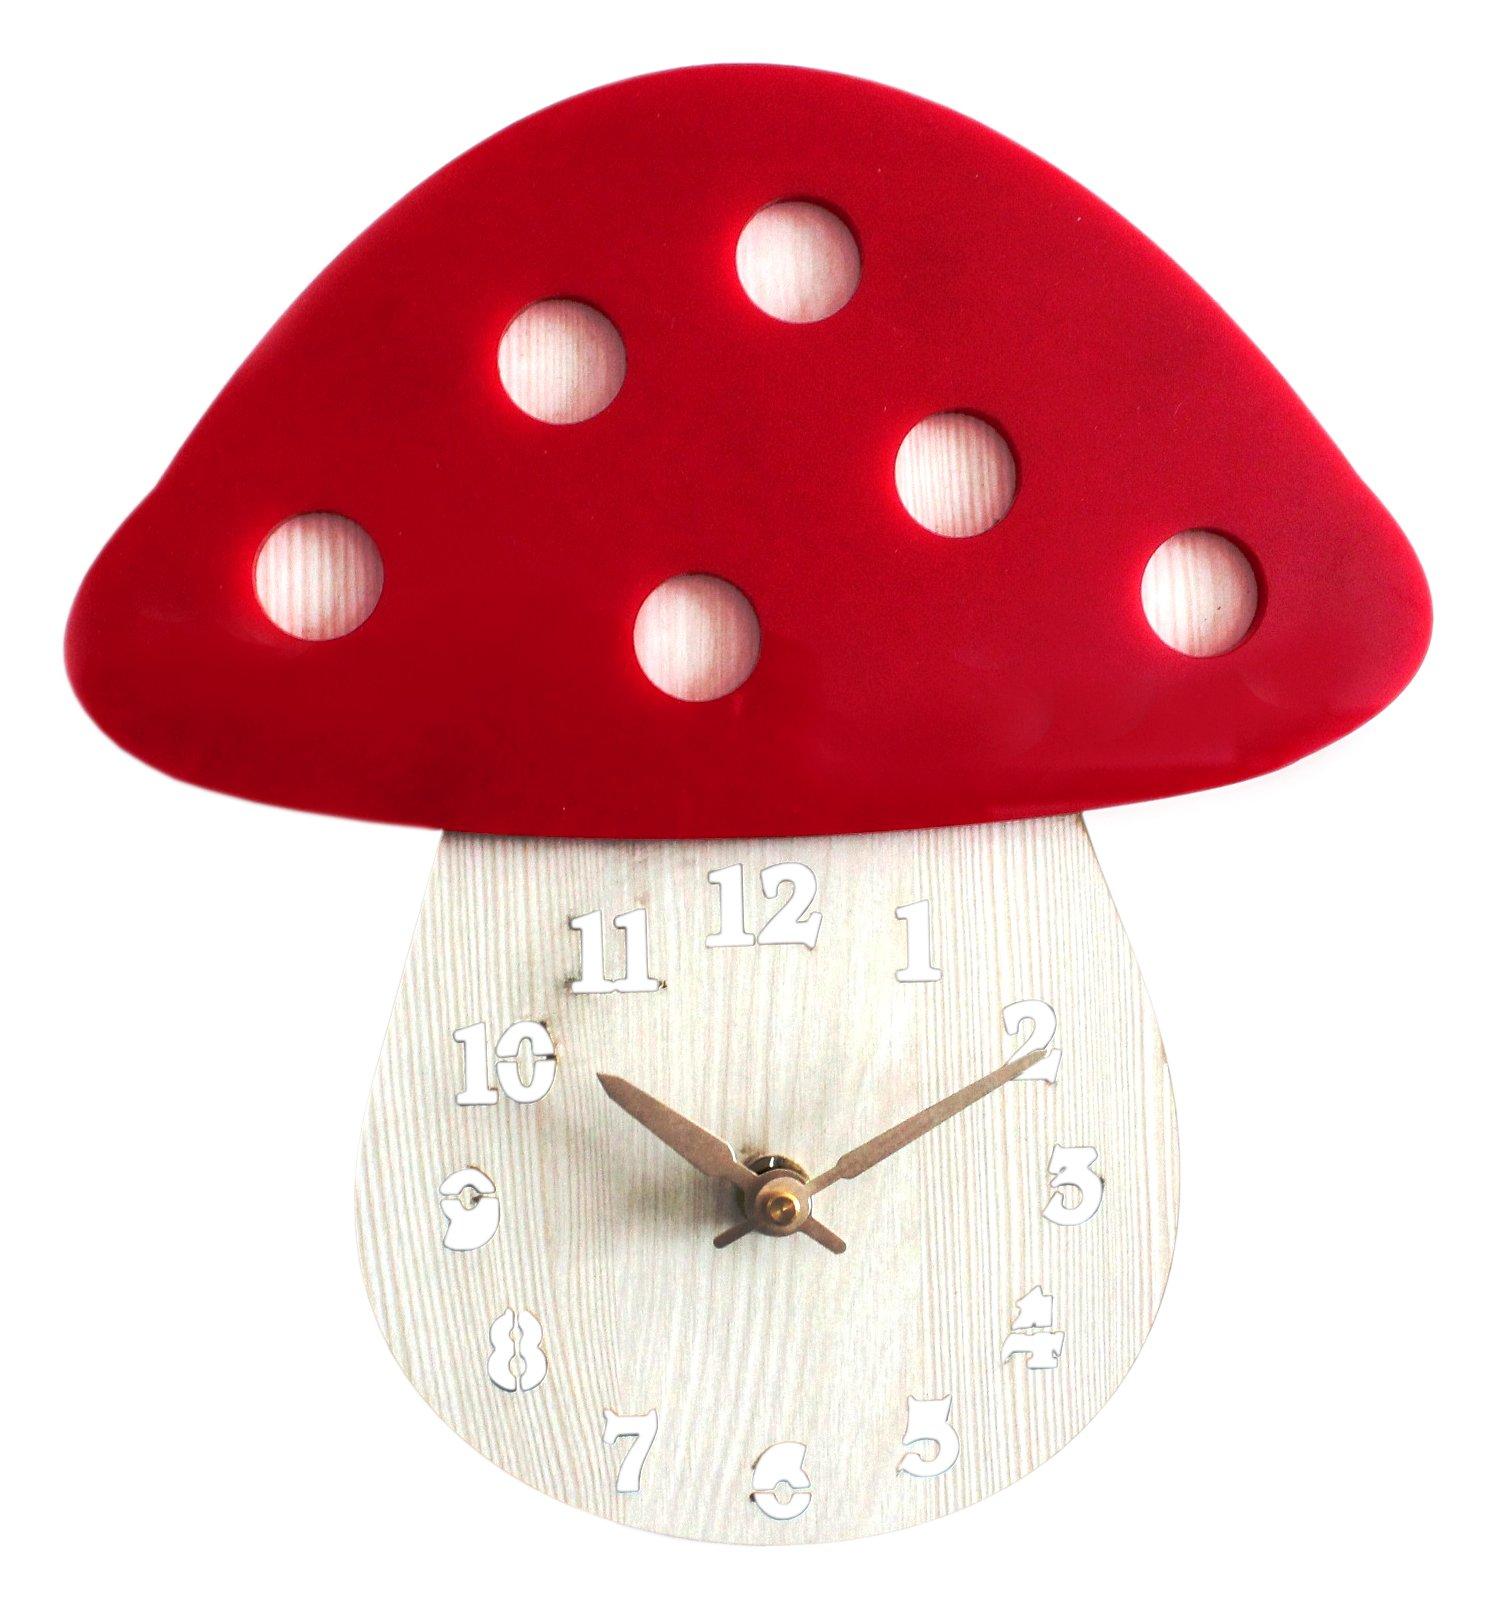 Pasargad Carpets Mushroom Home Decoration Hanging Clocks for Children Room, 11'' x 12'', Acrylic Red